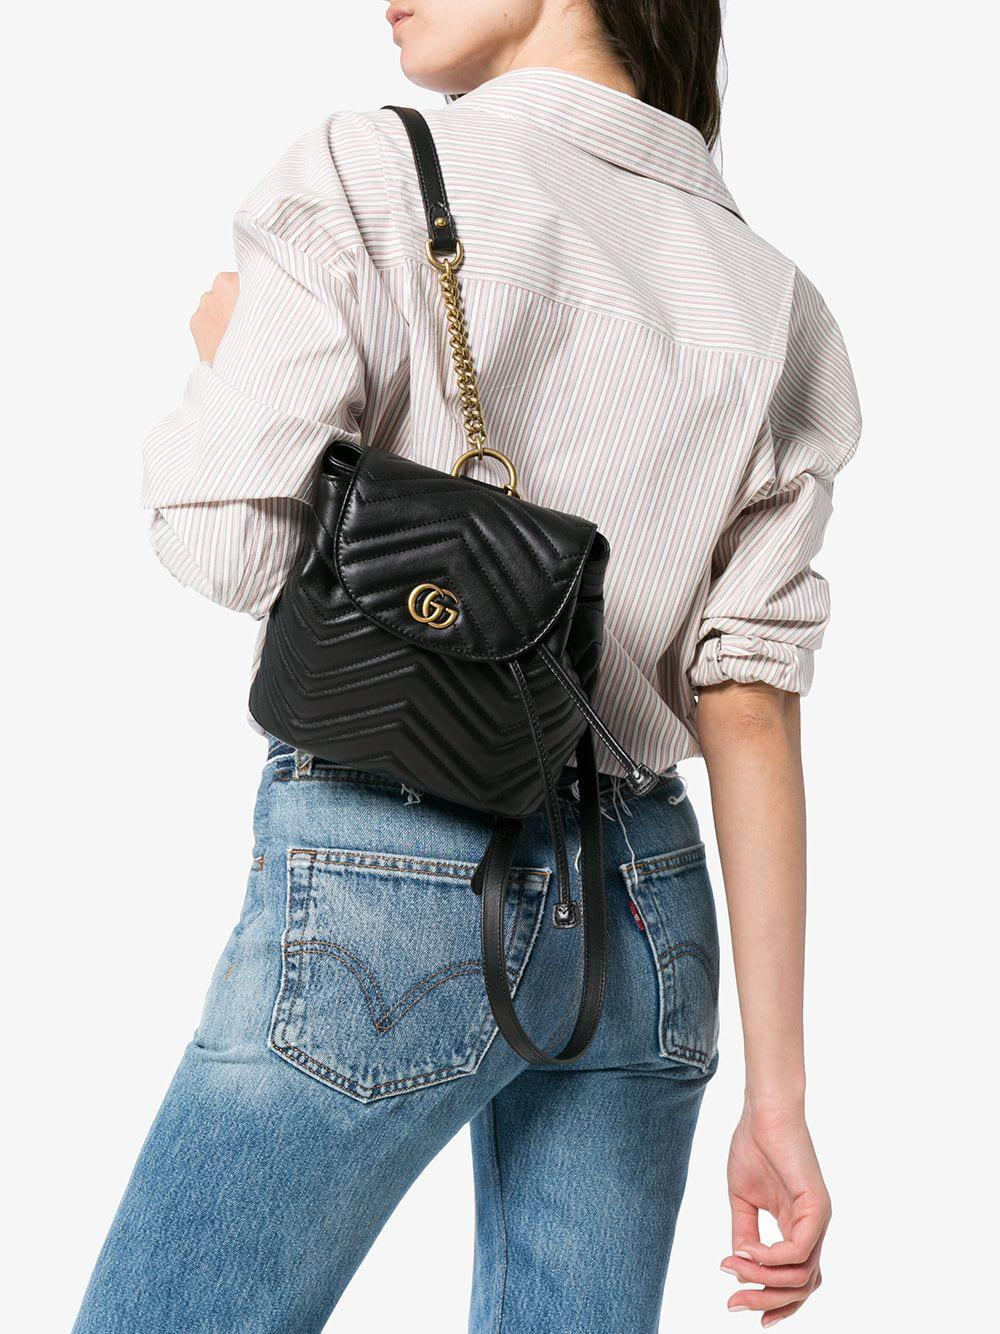 dbd10fb7f183 Gucci Black GG Marmont Matelassé Backpack in Black - Lyst